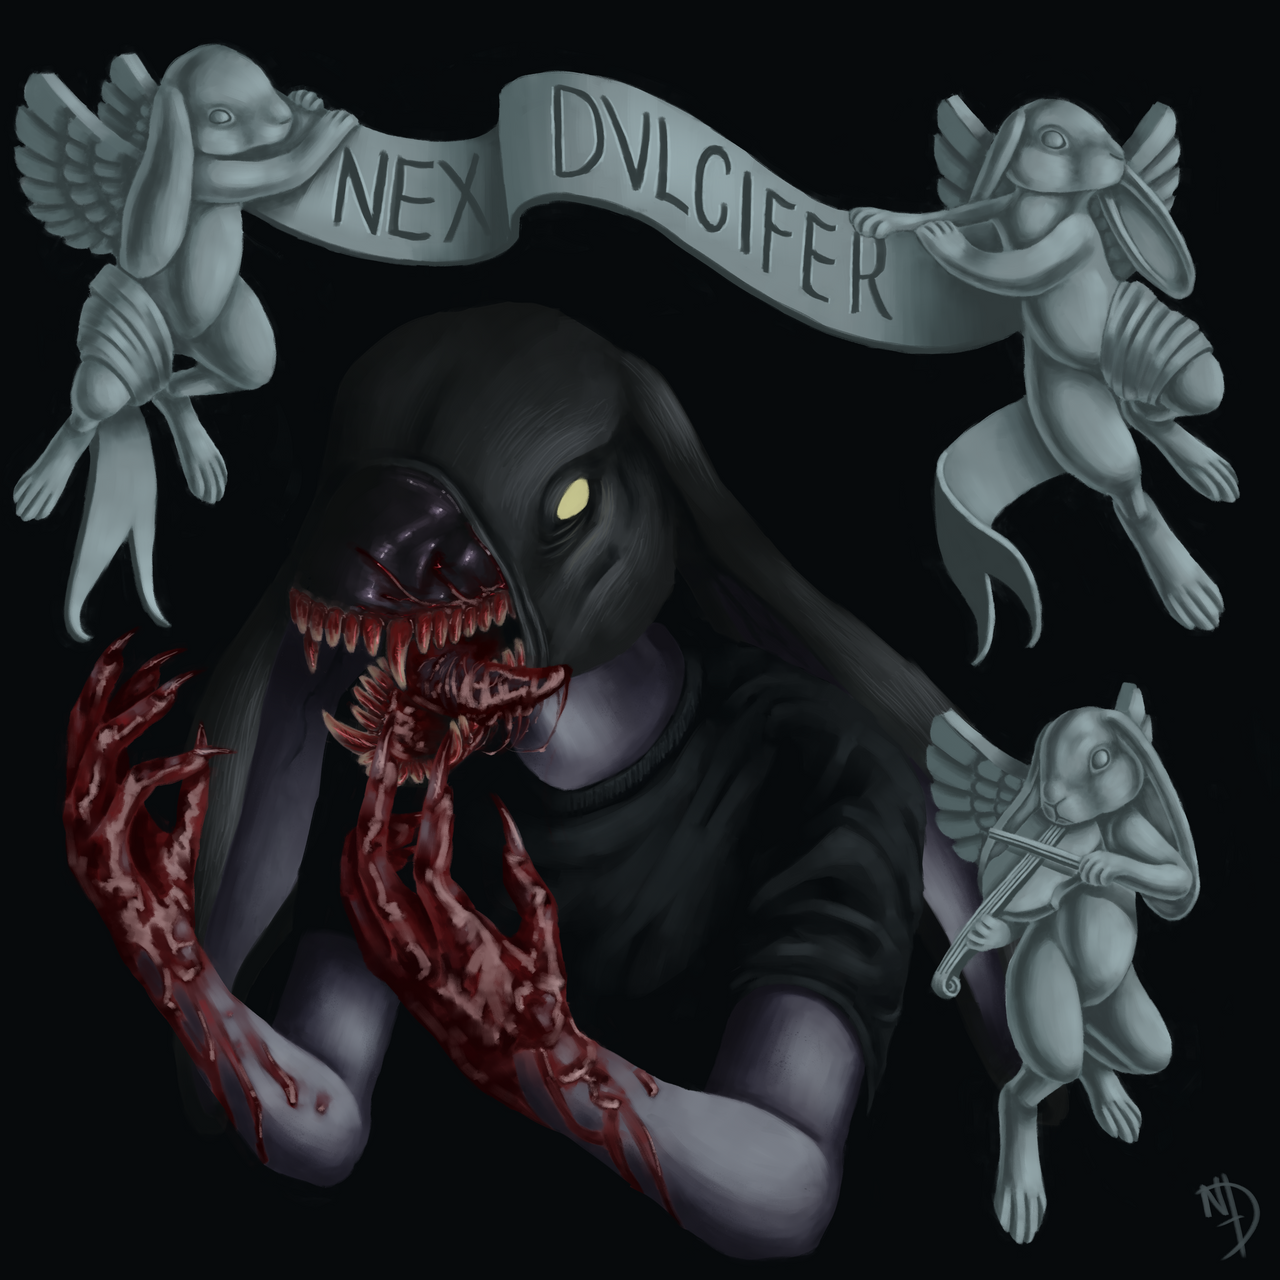 NexDulcifer's Profile Picture